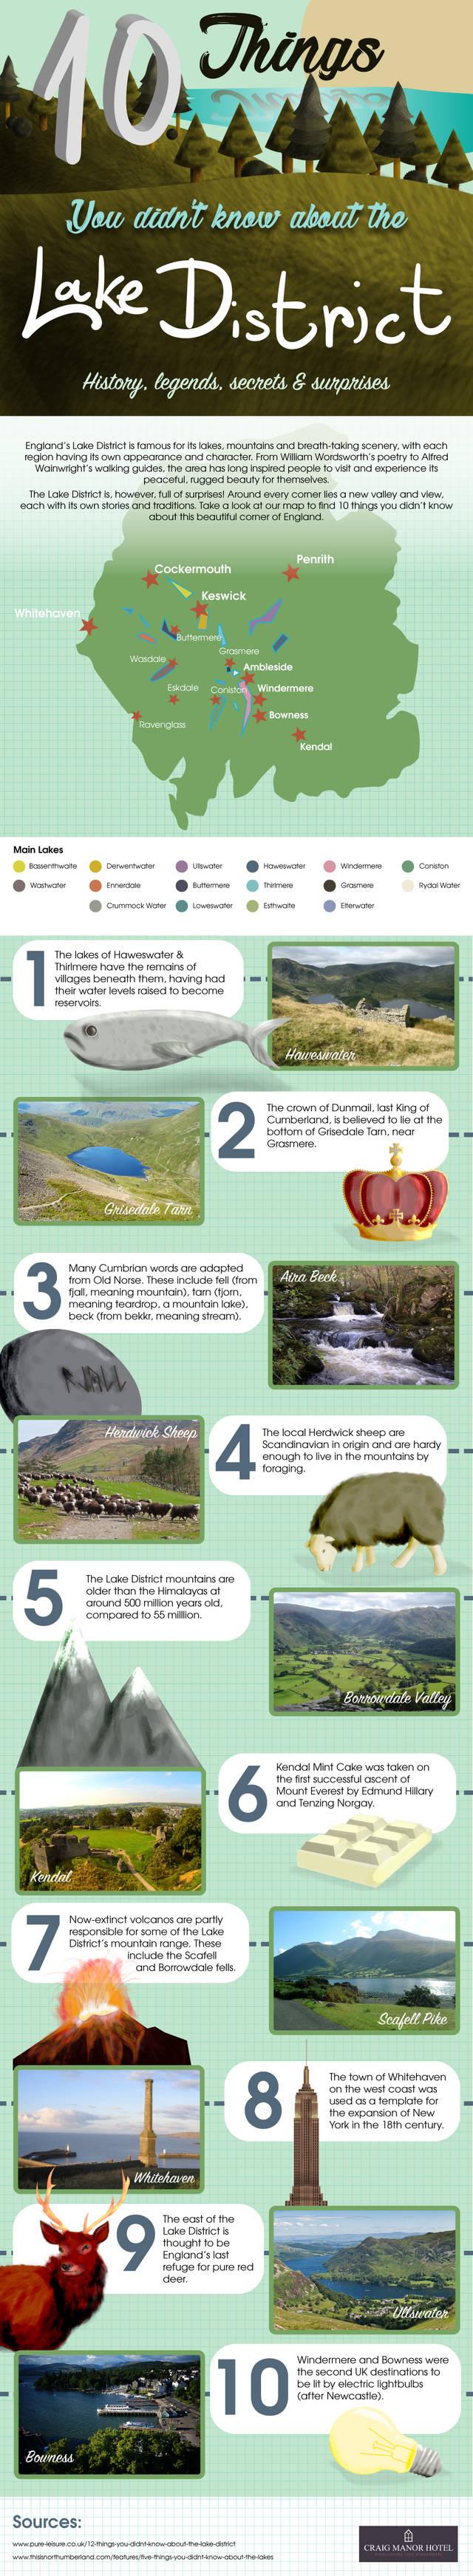 Lakes facts v4